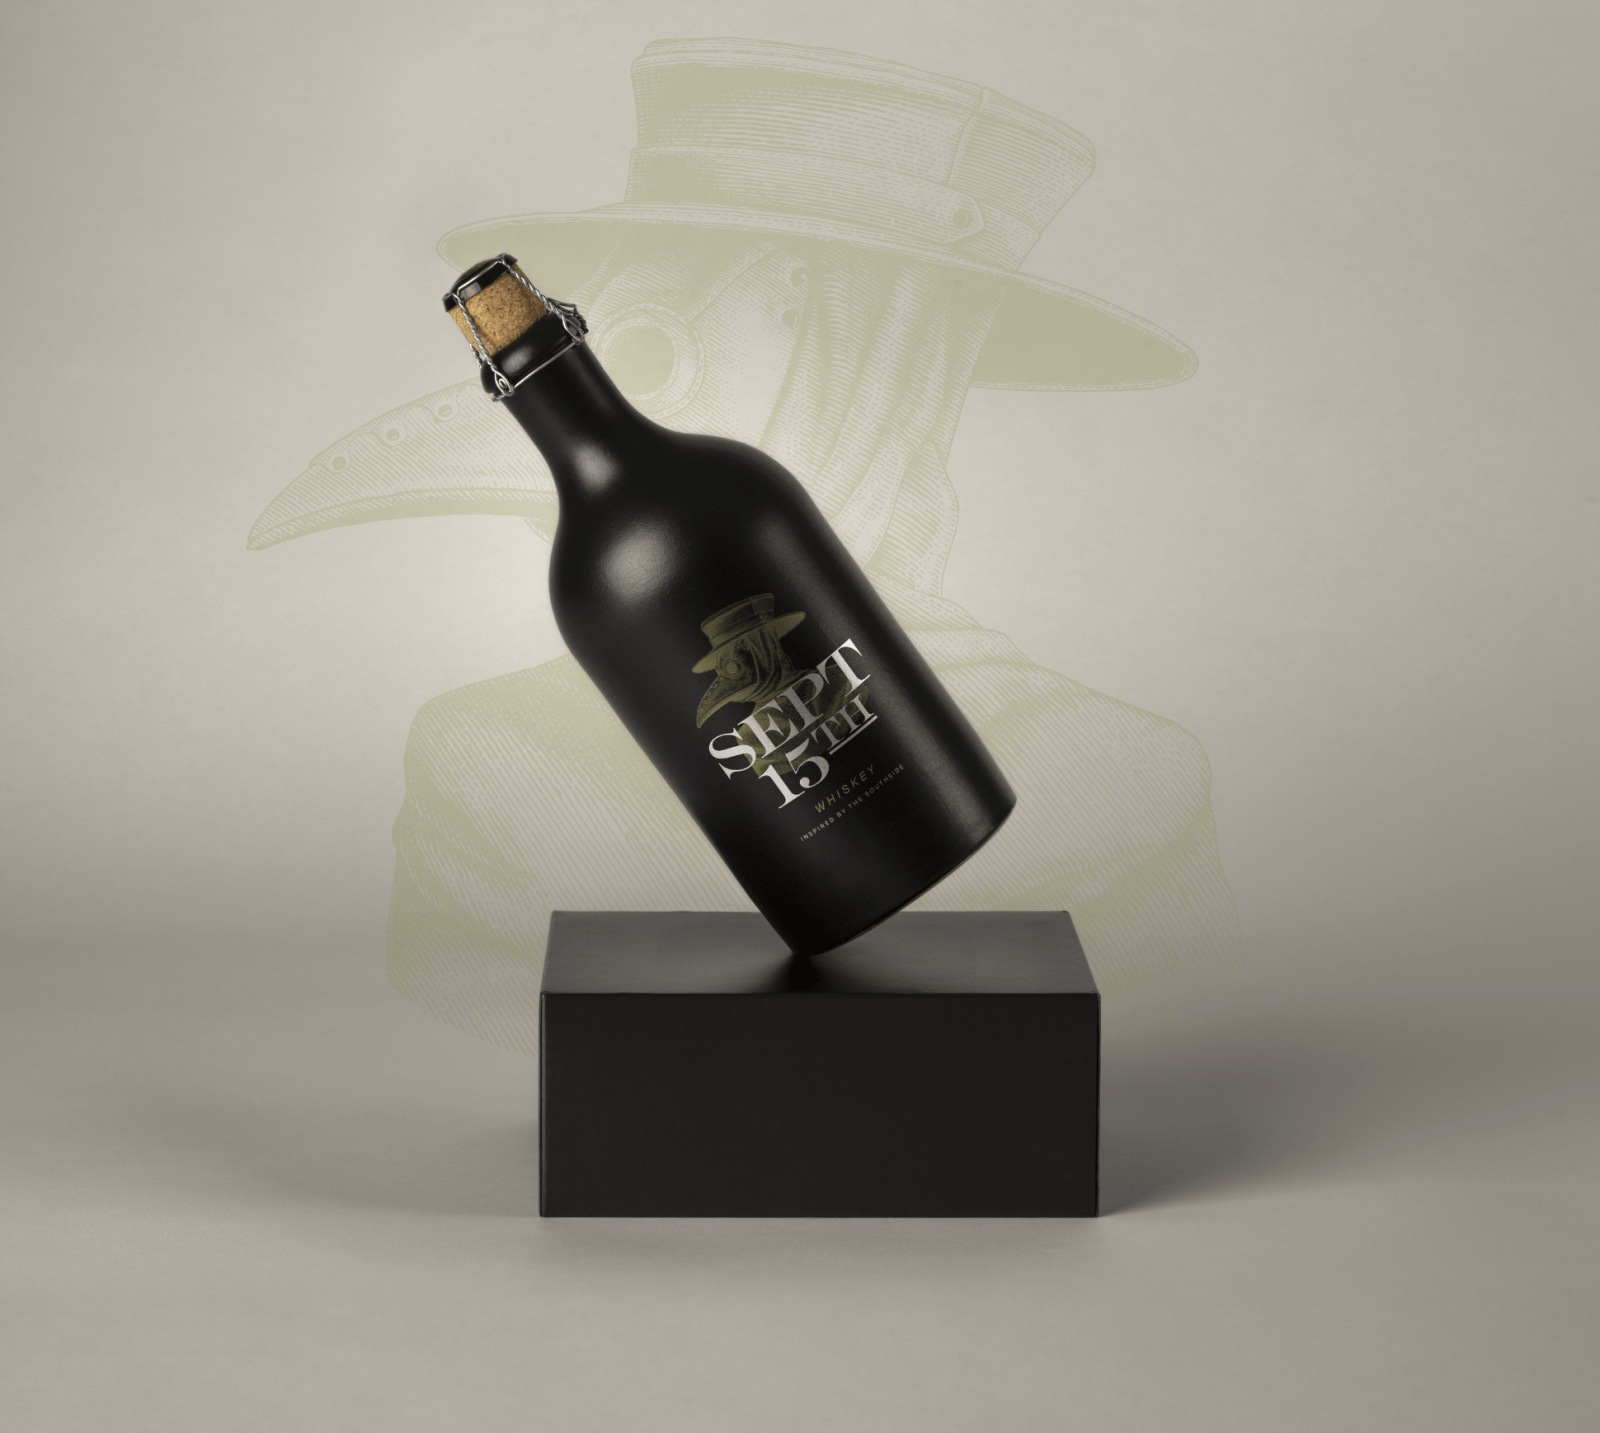 South Side Vintage Whiskey Identity Design